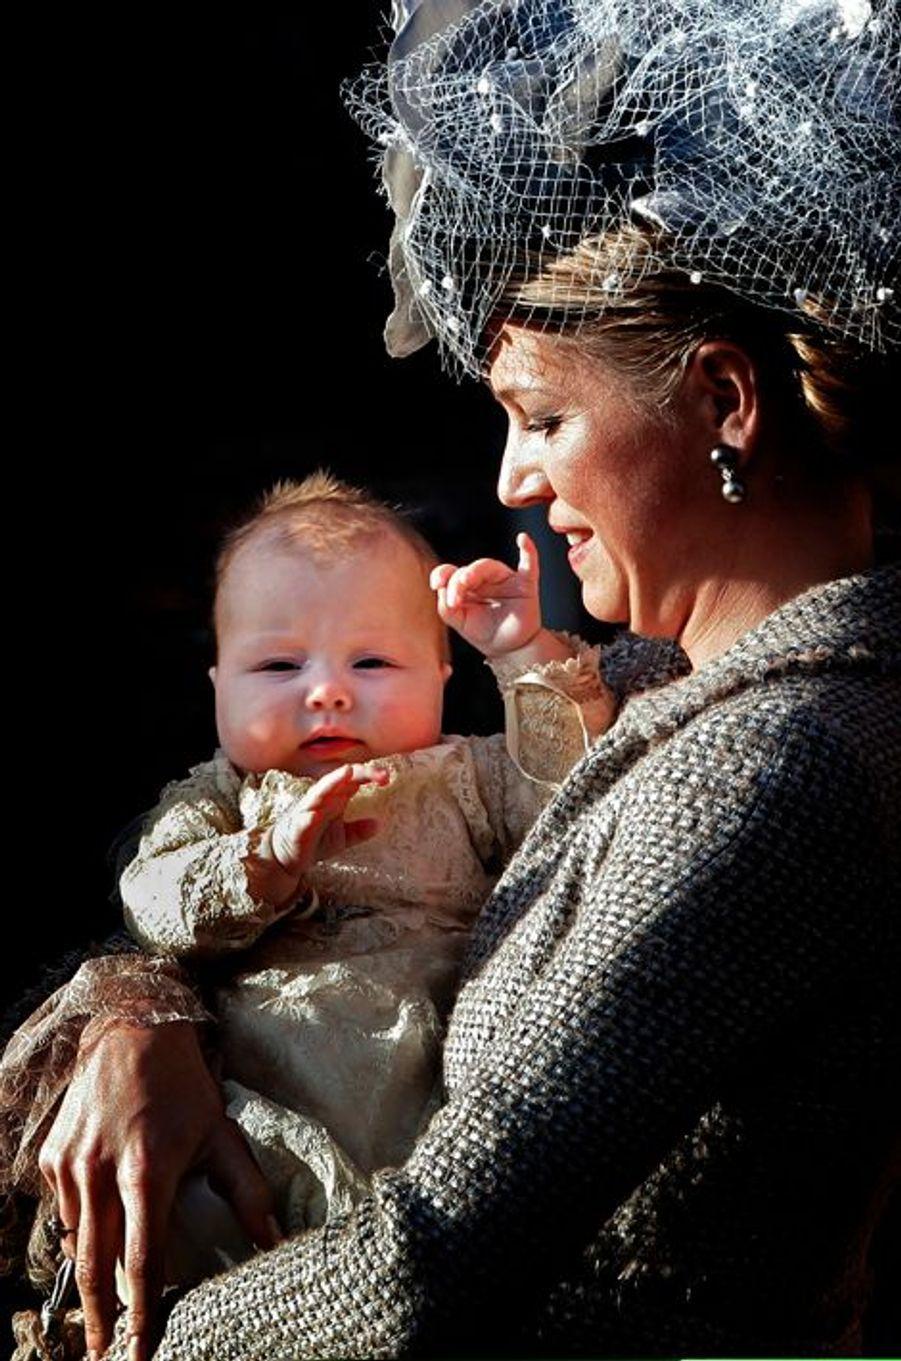 La princesse Alexia avec sa mère Maxima, le 19 novembre 2005